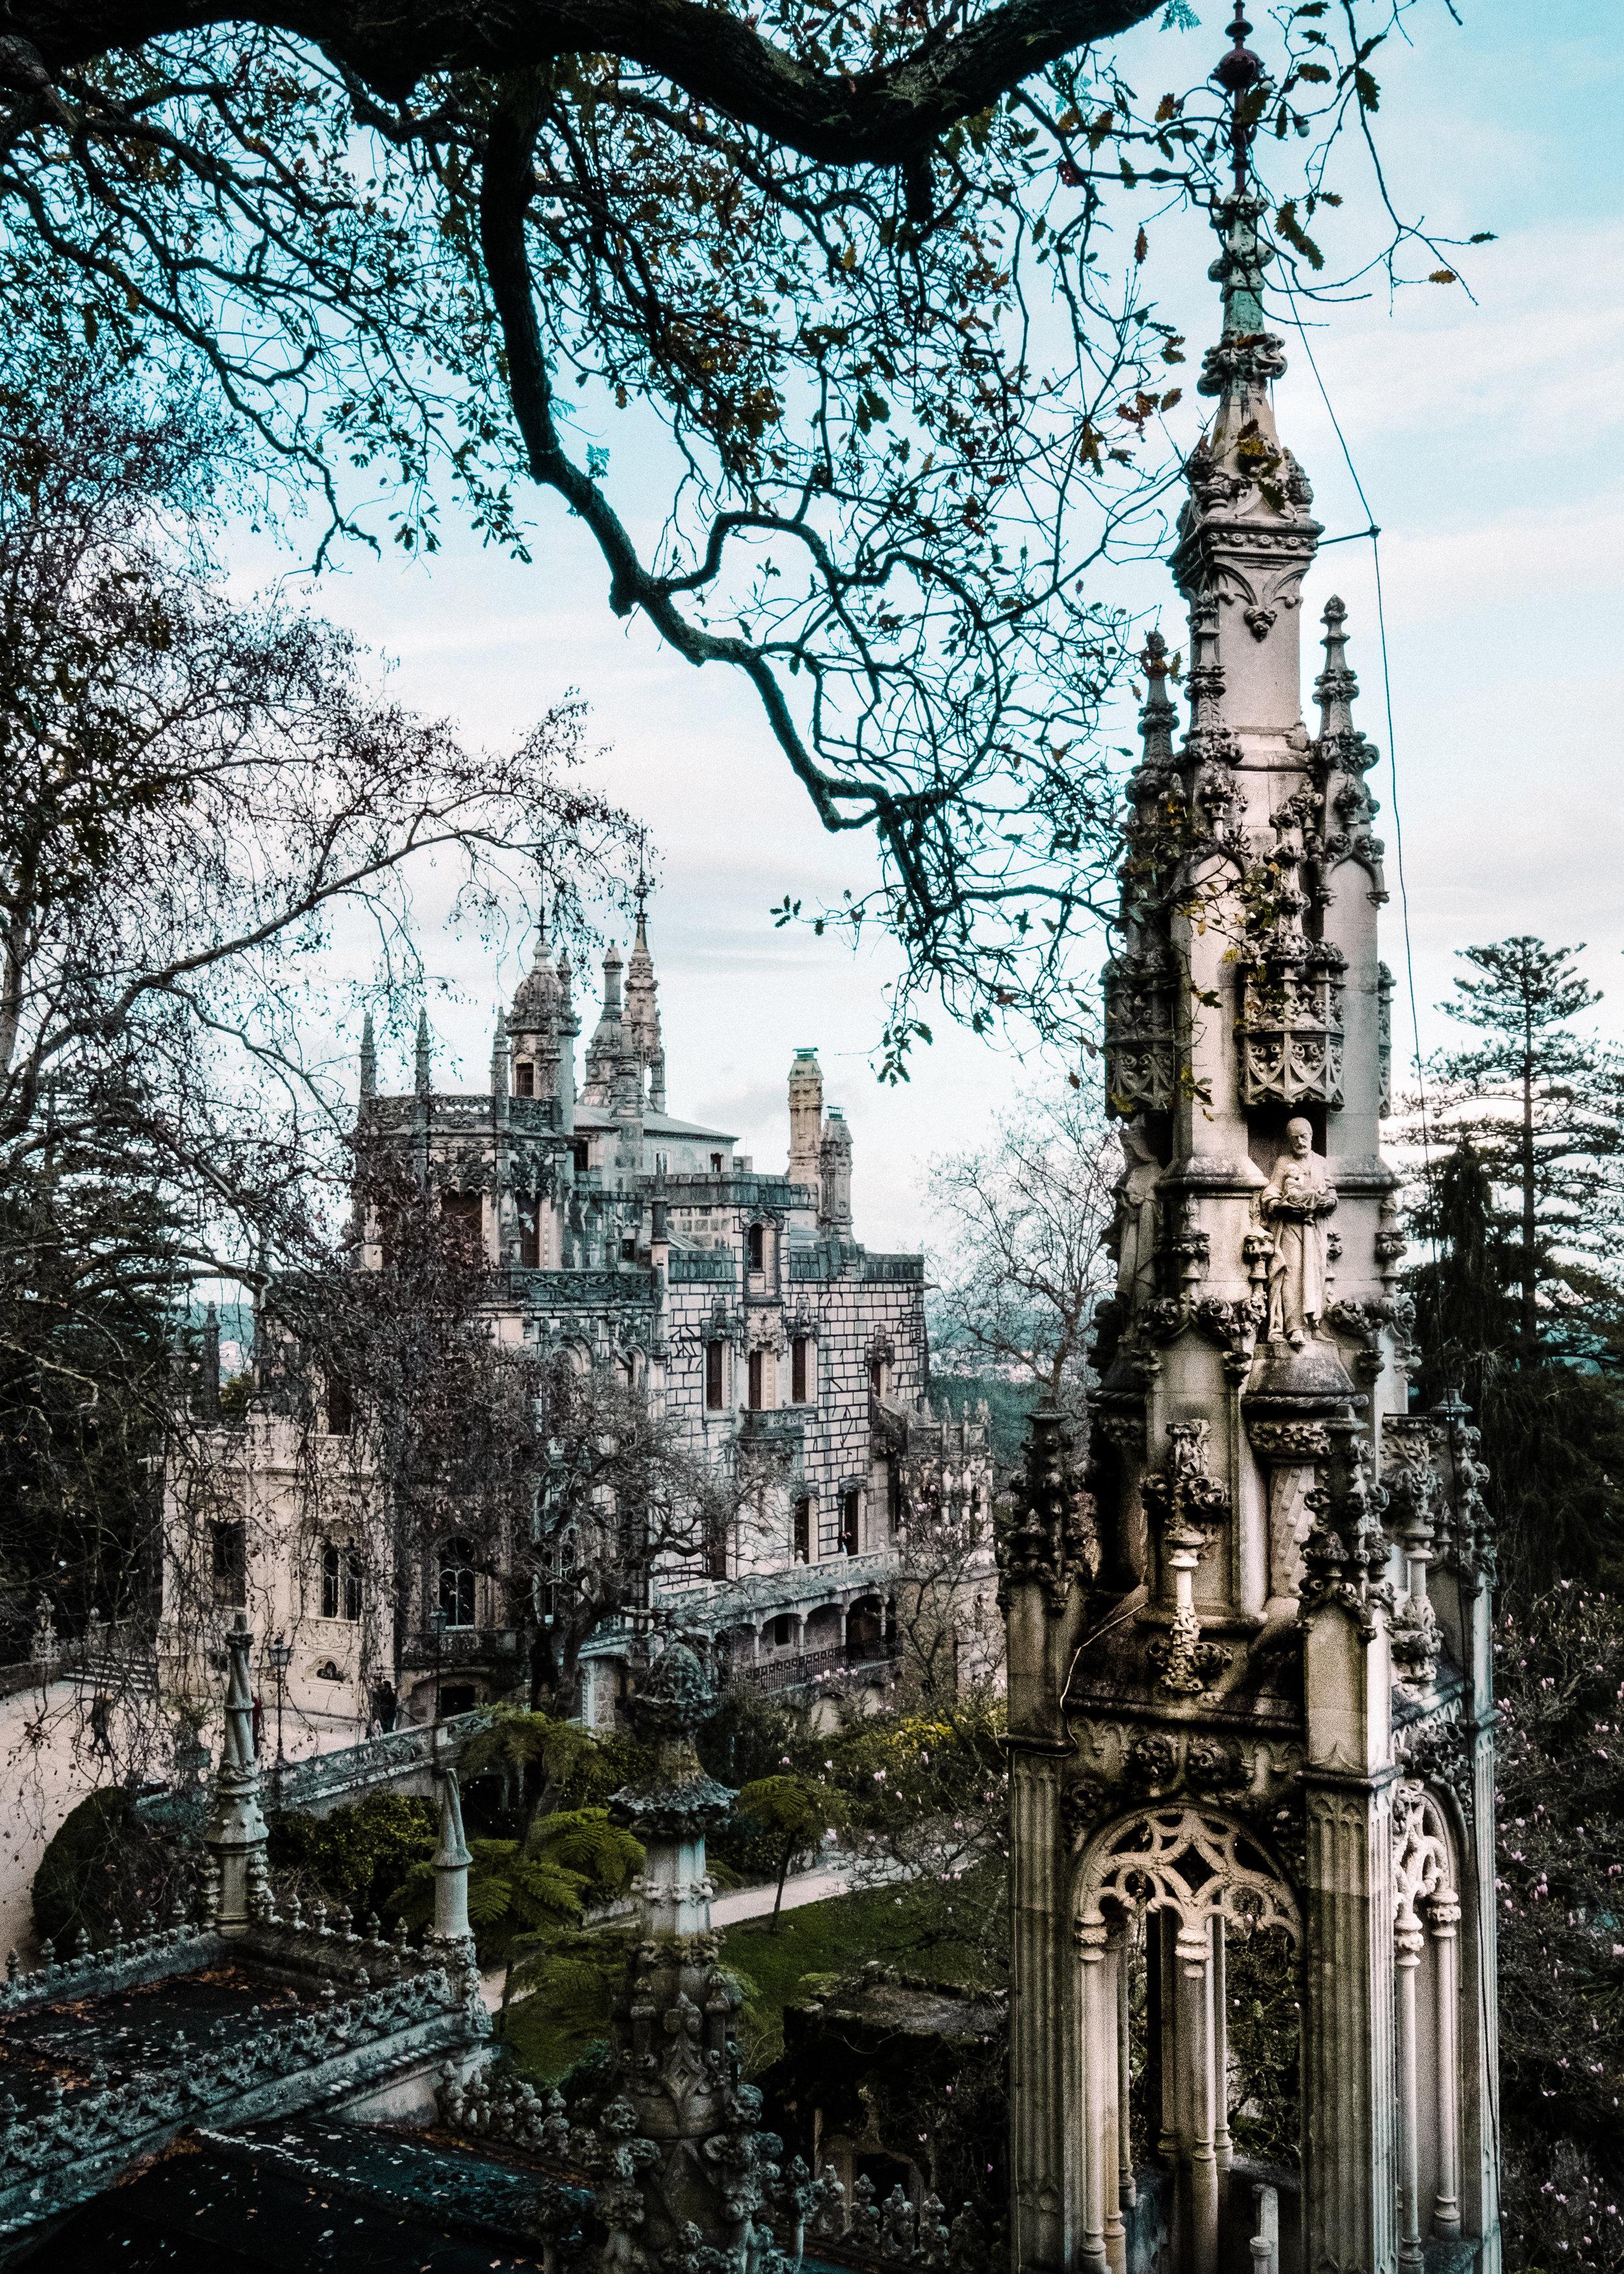 QuintadaRegaleira_Sintra_Portugal_JuliaMattis_Photo14.jpg